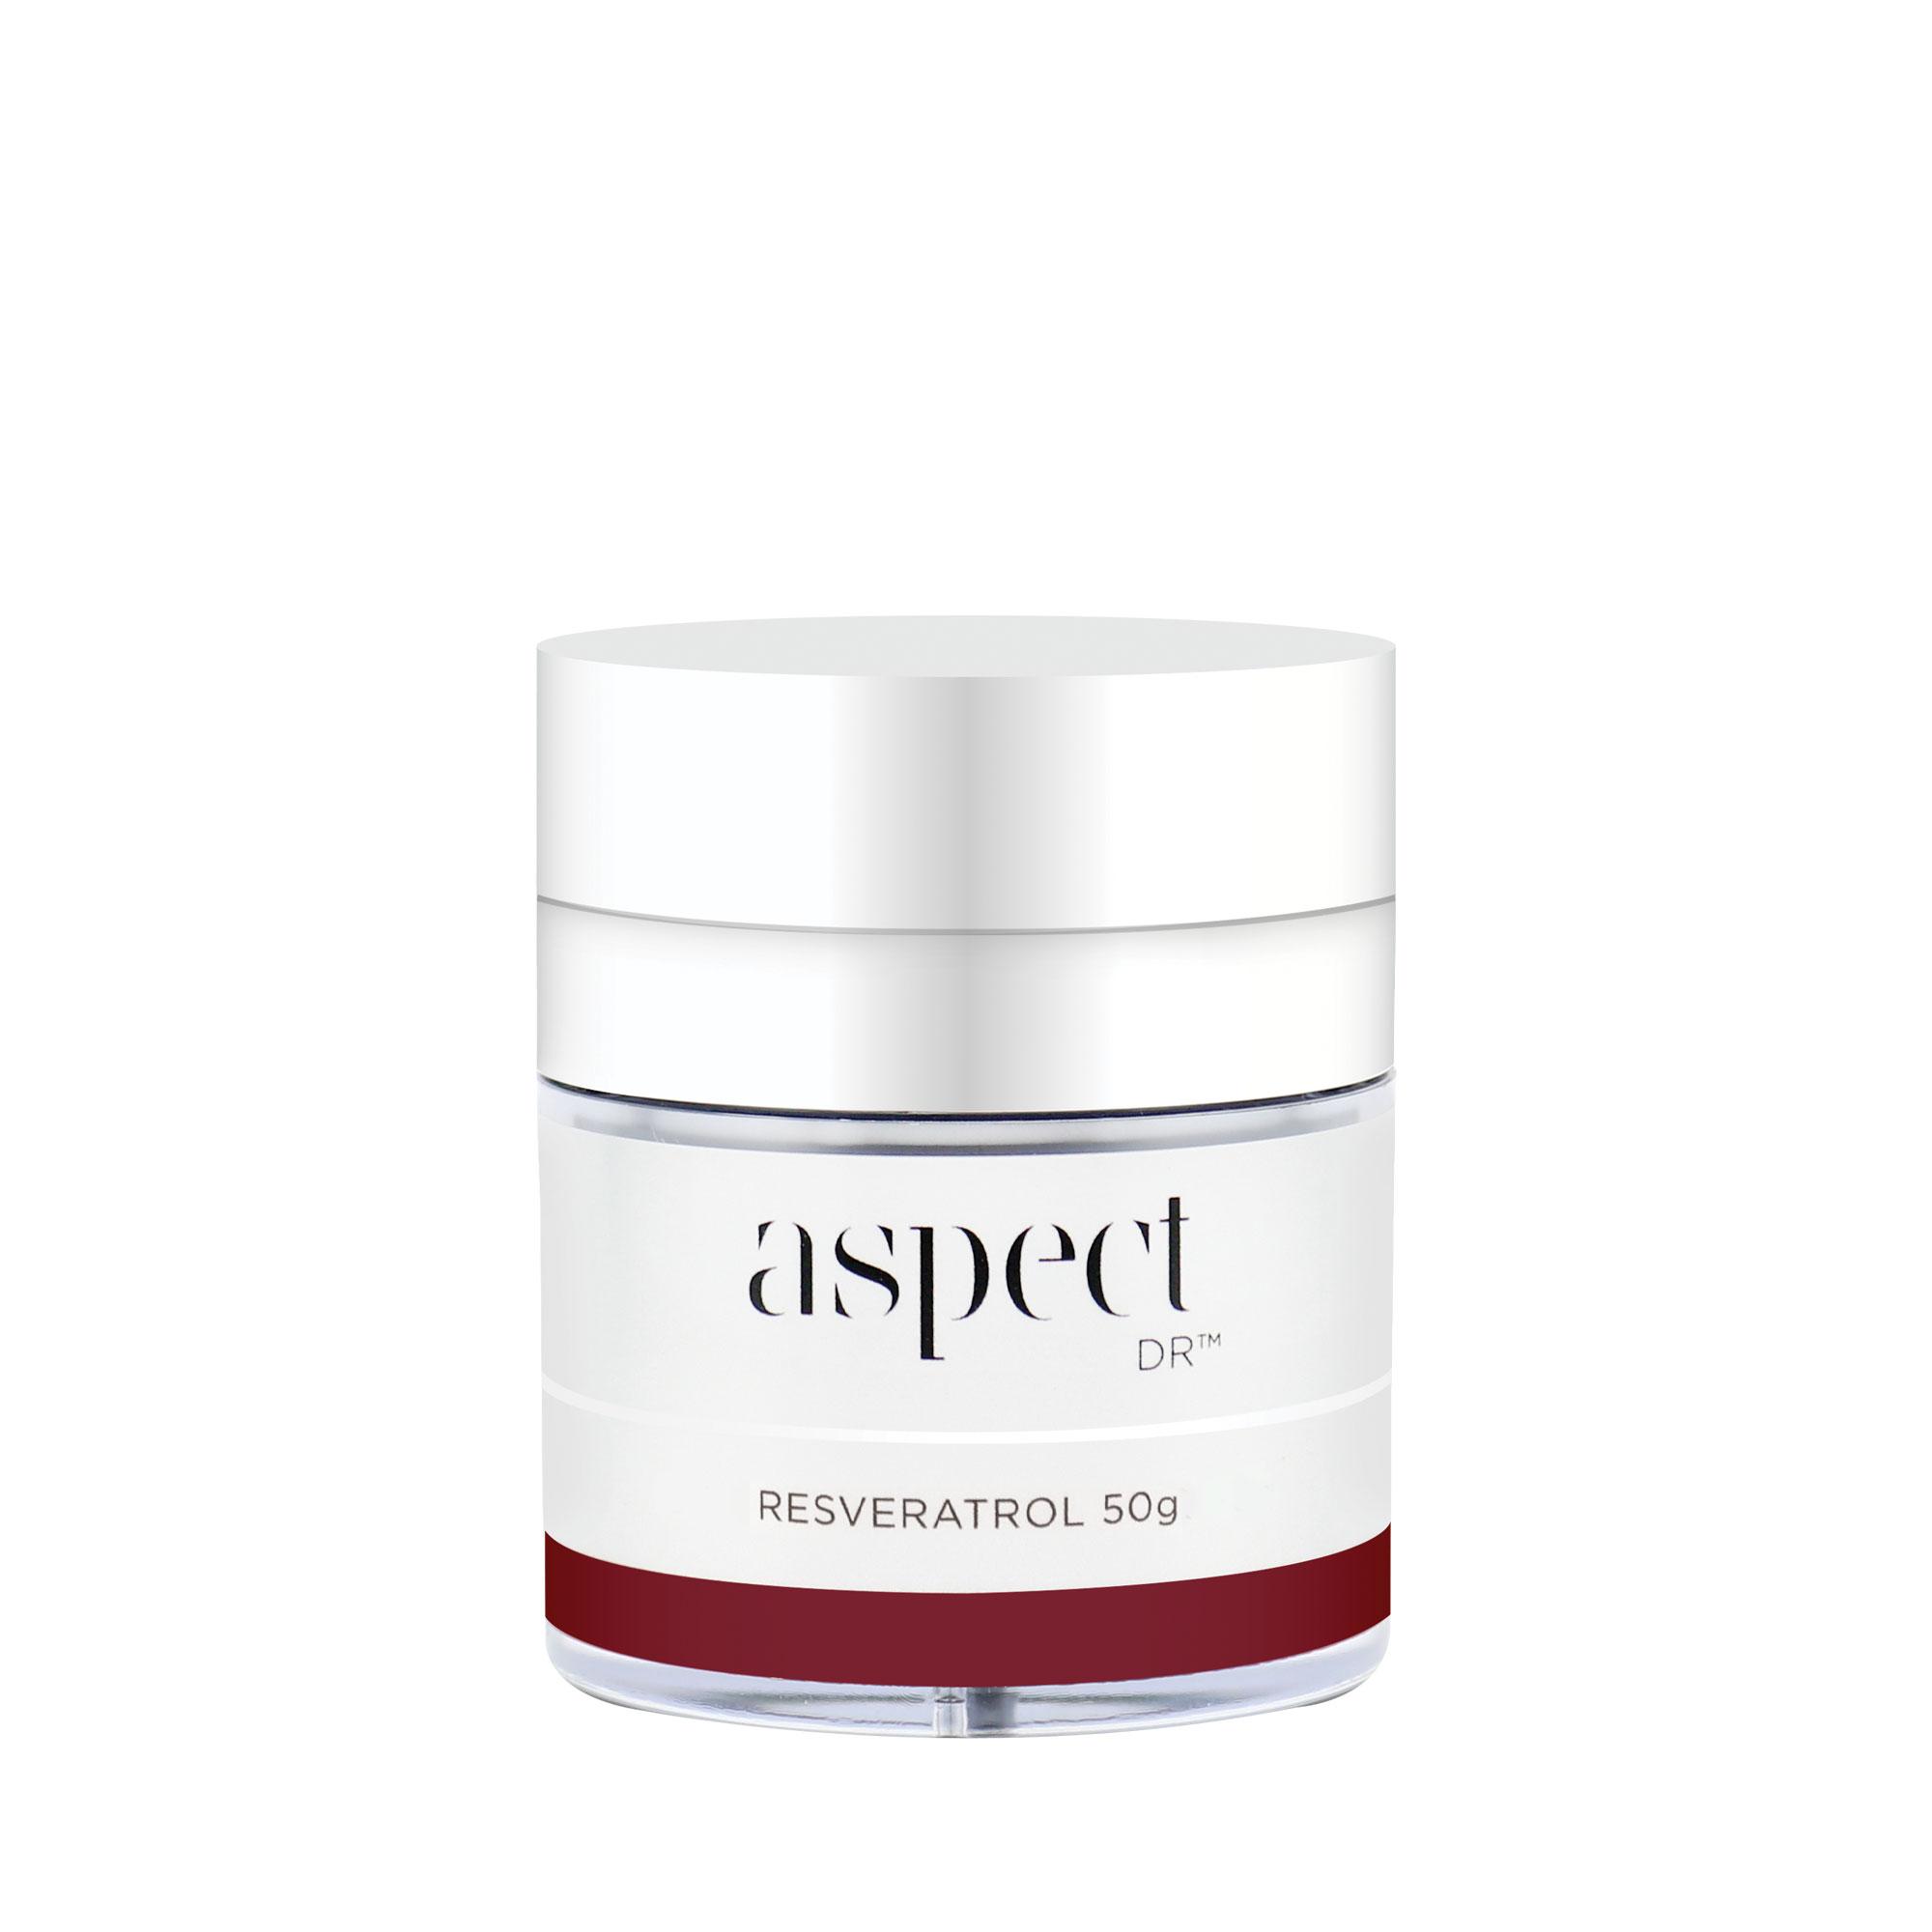 Resveratrol Moisturising Cream 50g Airless Pump